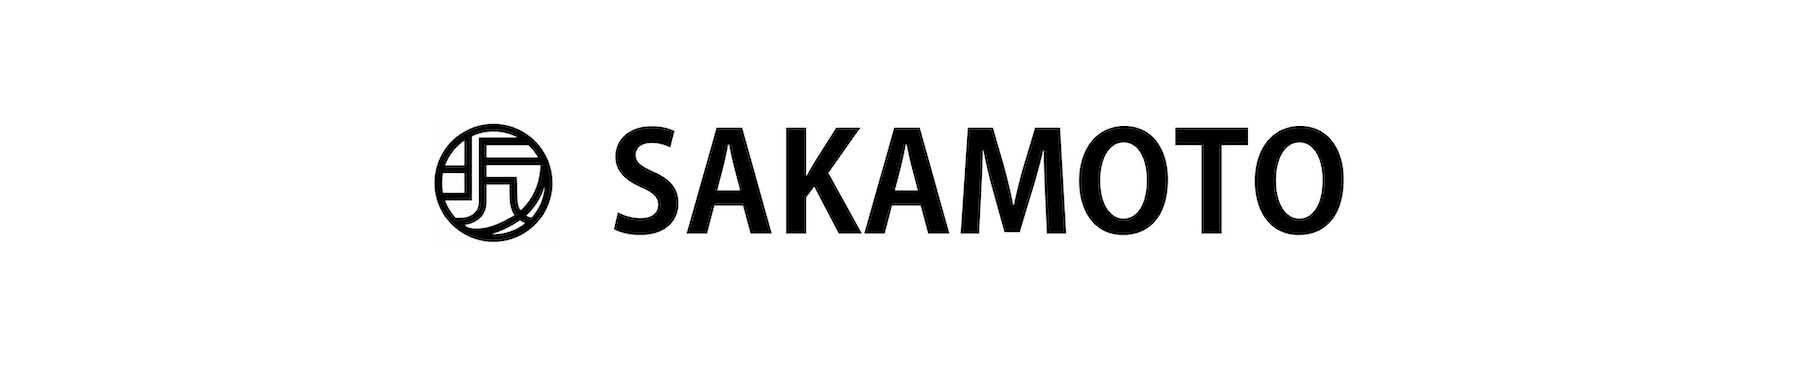 SAKAMOTO - 神楽坂の製作所がだすお店